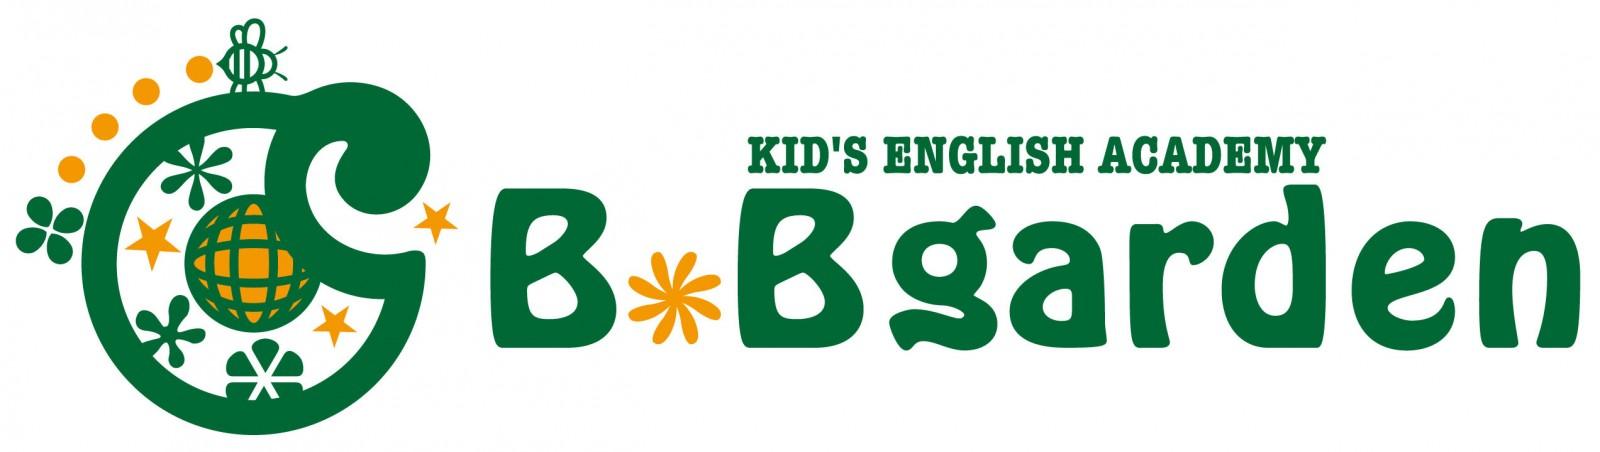 B.Bgarden | 三鷹市牟礼・下連雀の子ども英語教室